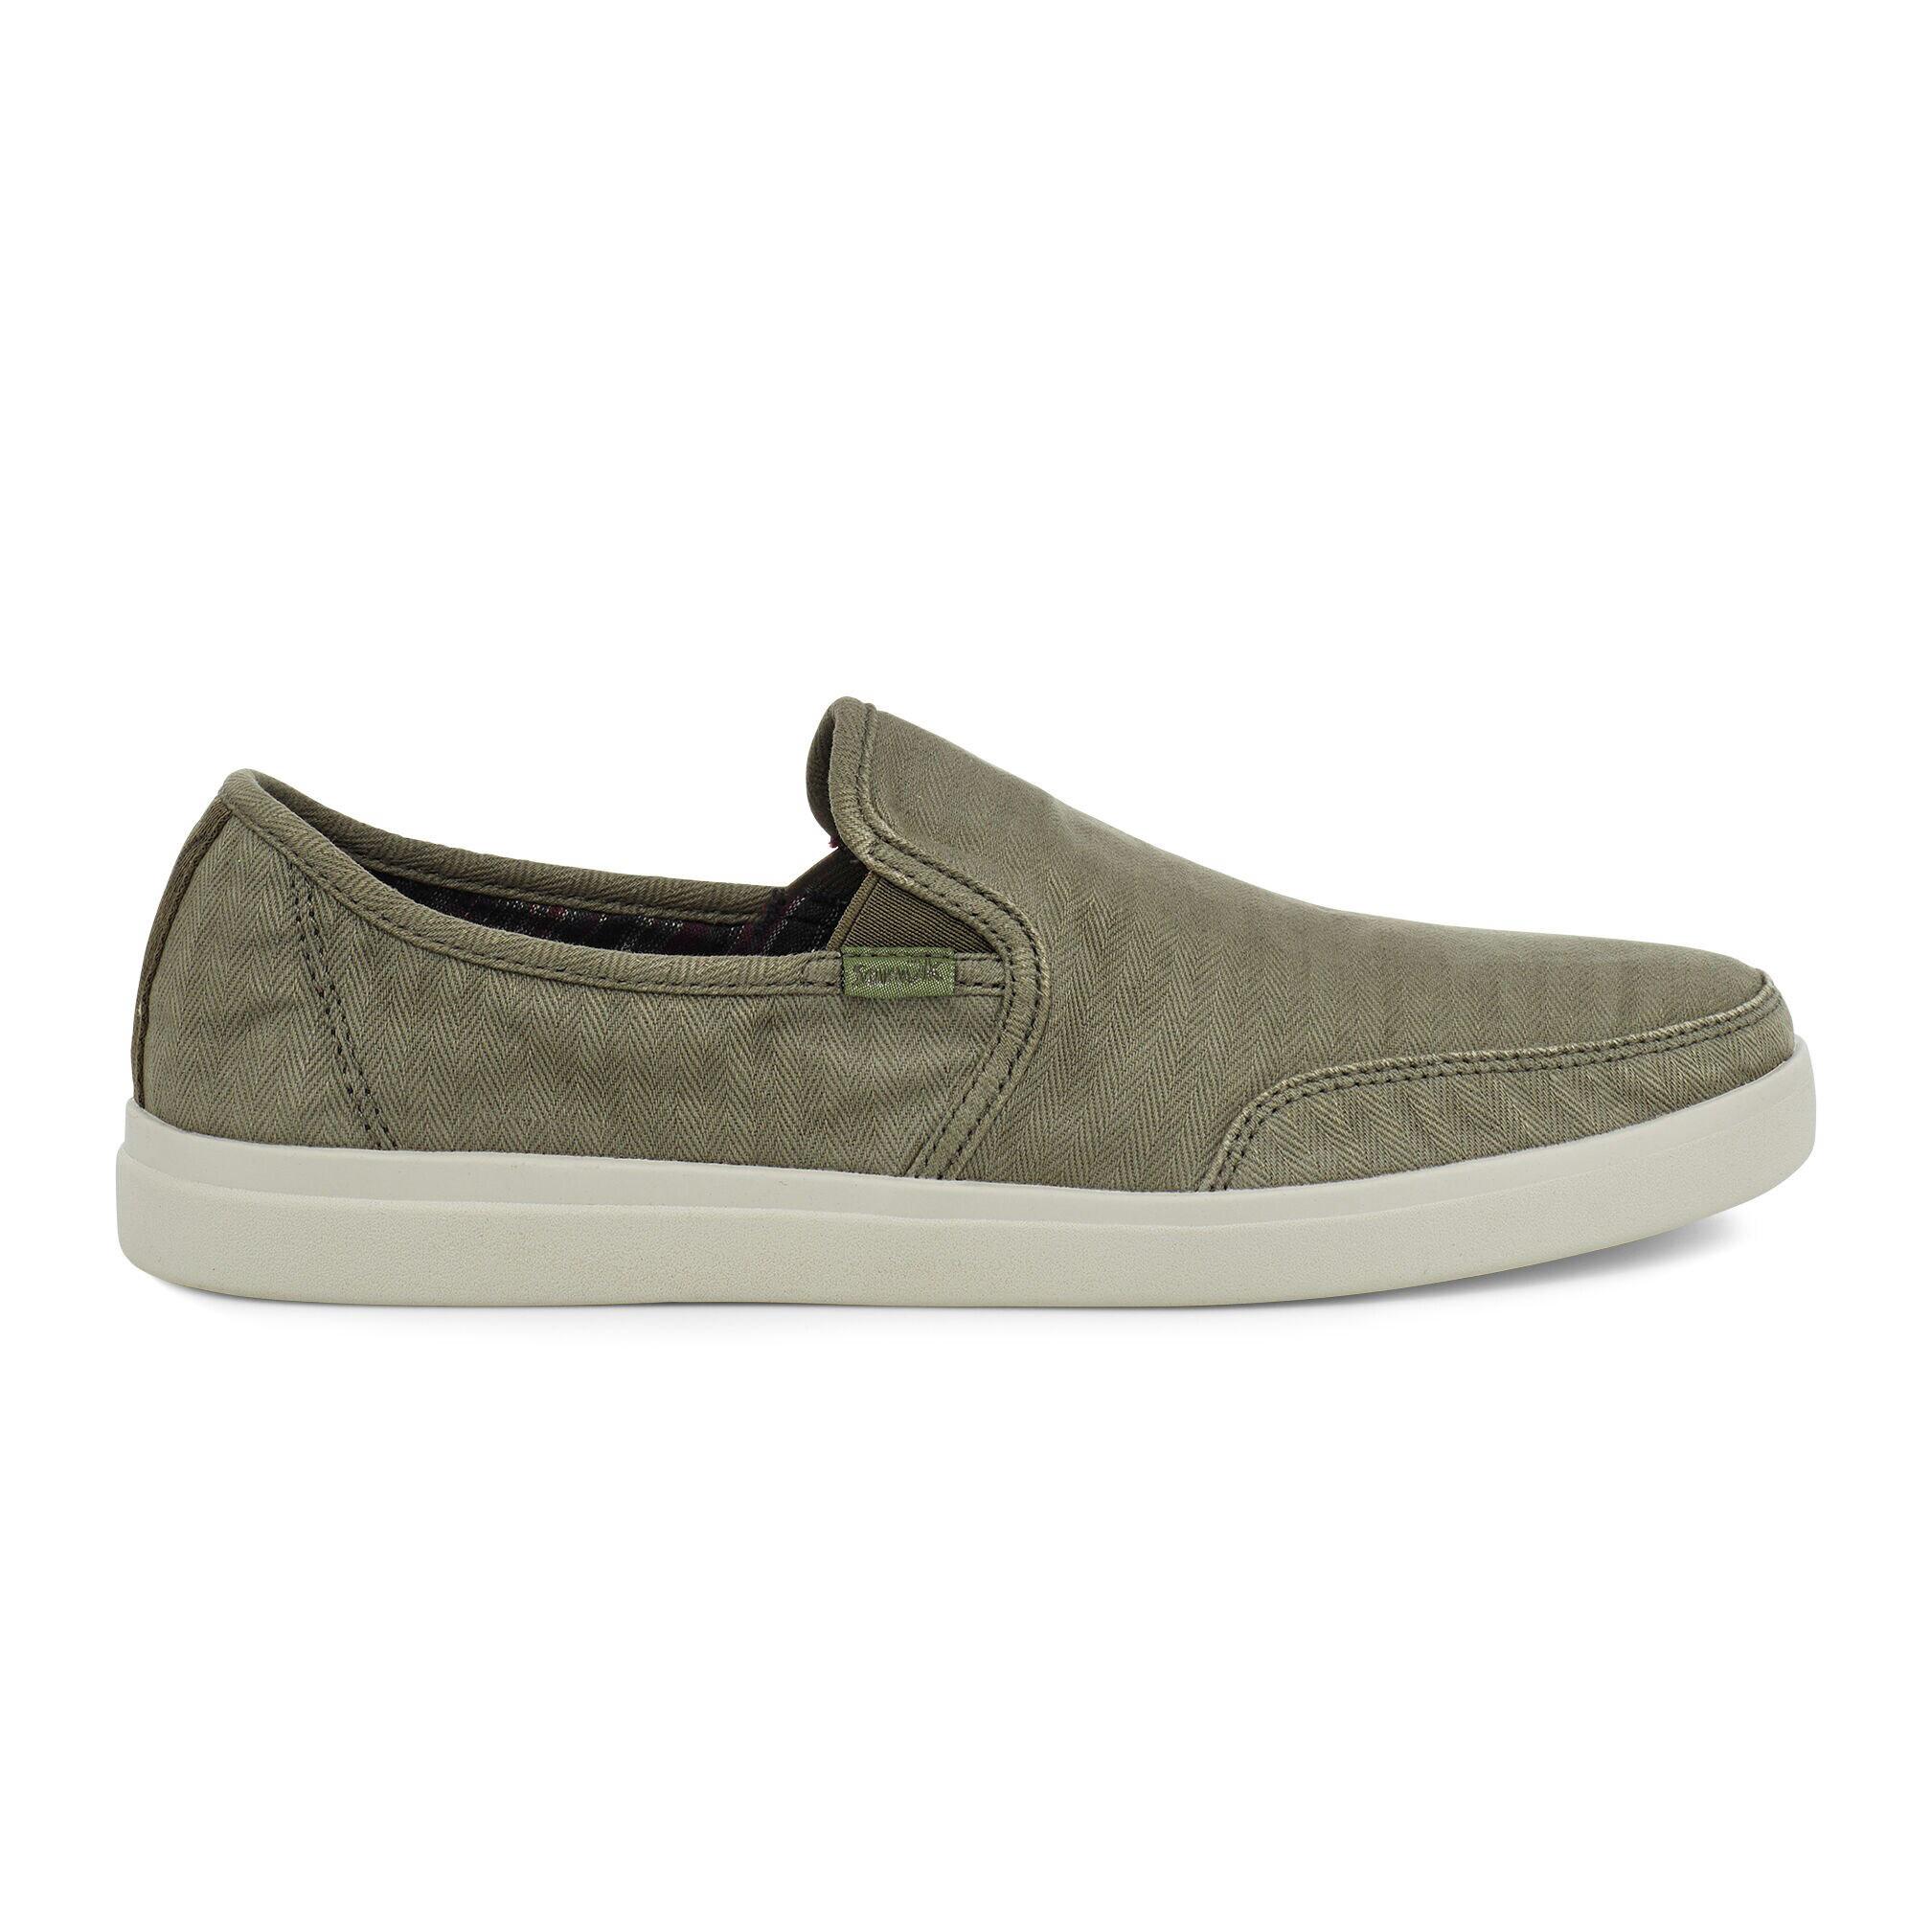 Sanuk Sanuk Vagabond Slip-On Sneaker Wash- Olive